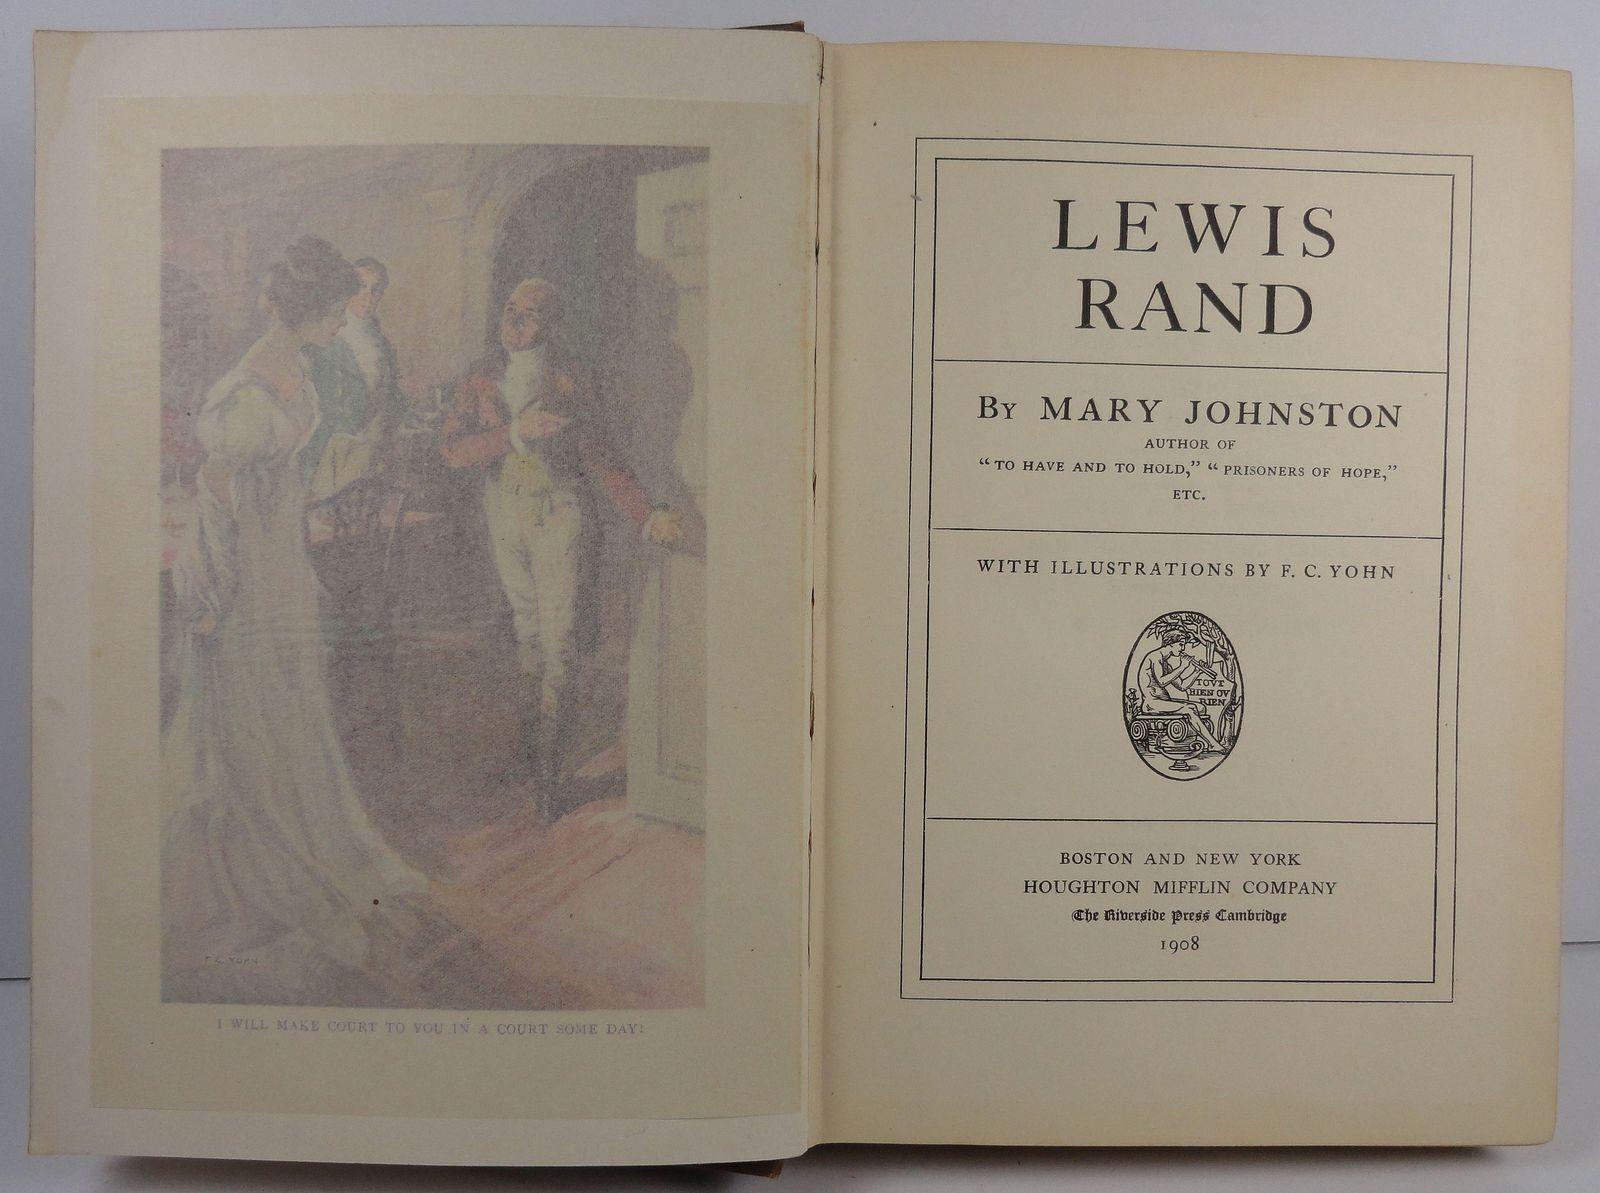 Lewis Rand by Mary Johnston F. C. Yohn Illustrations 1908